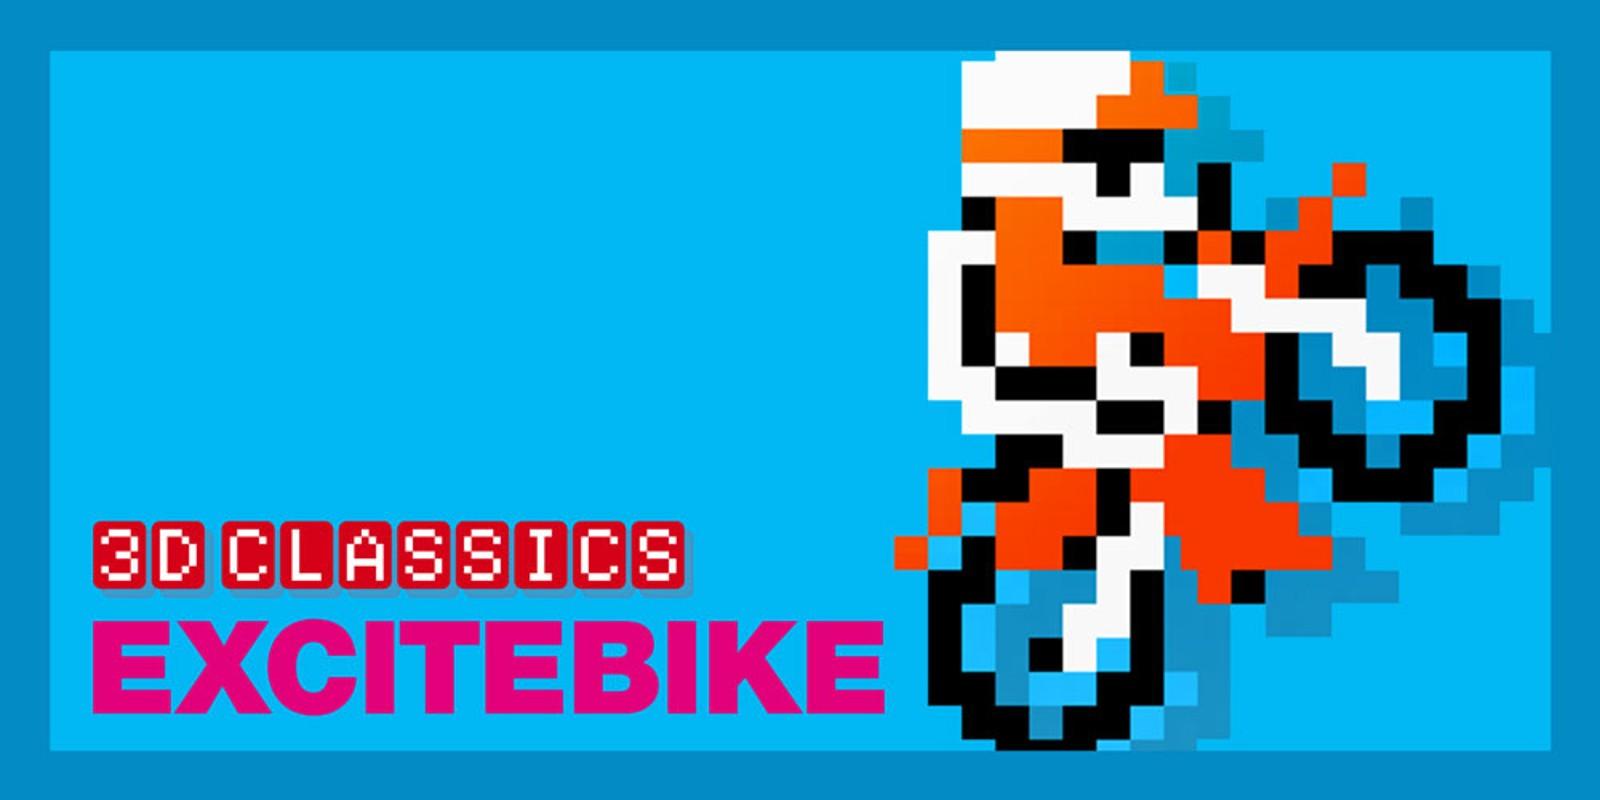 Kids Animal Wallpaper 3d Classics Excitebike Nintendo 3ds Download Software